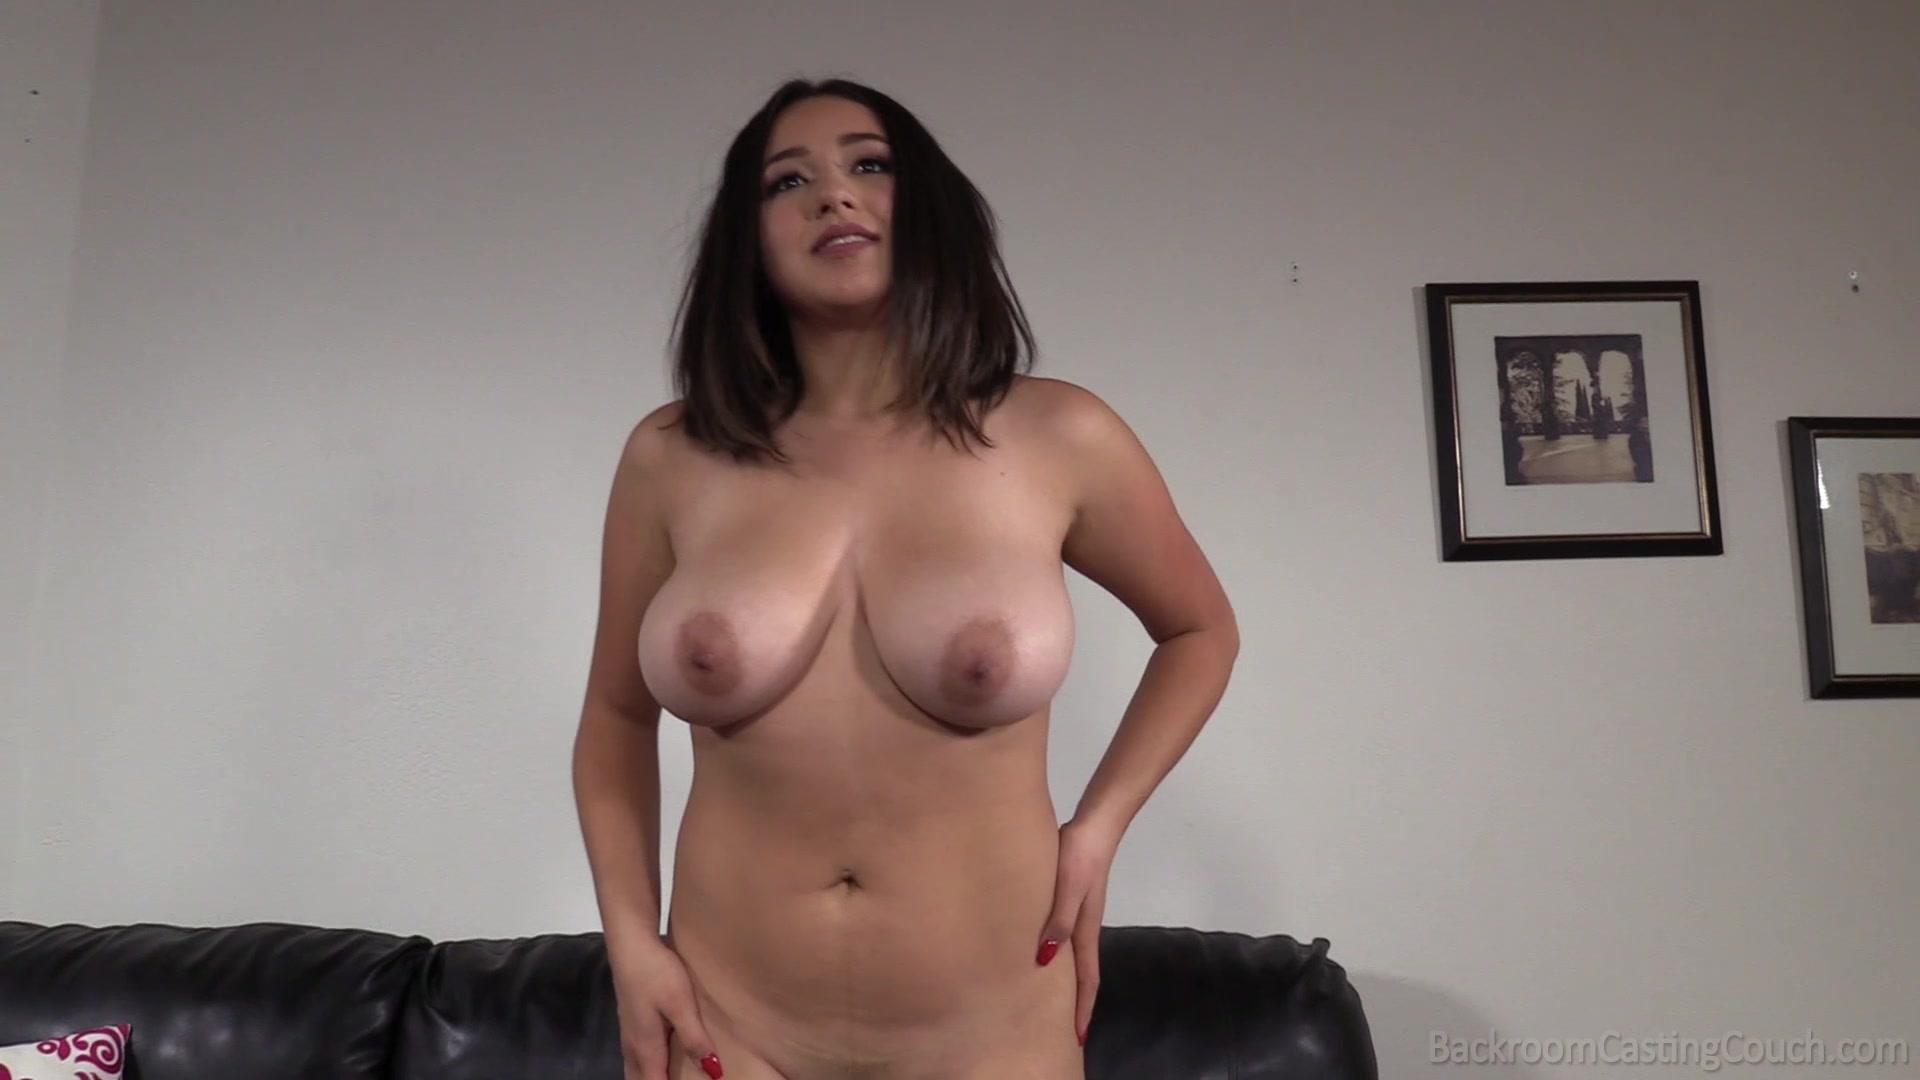 Casting Couch Hd Big Tits